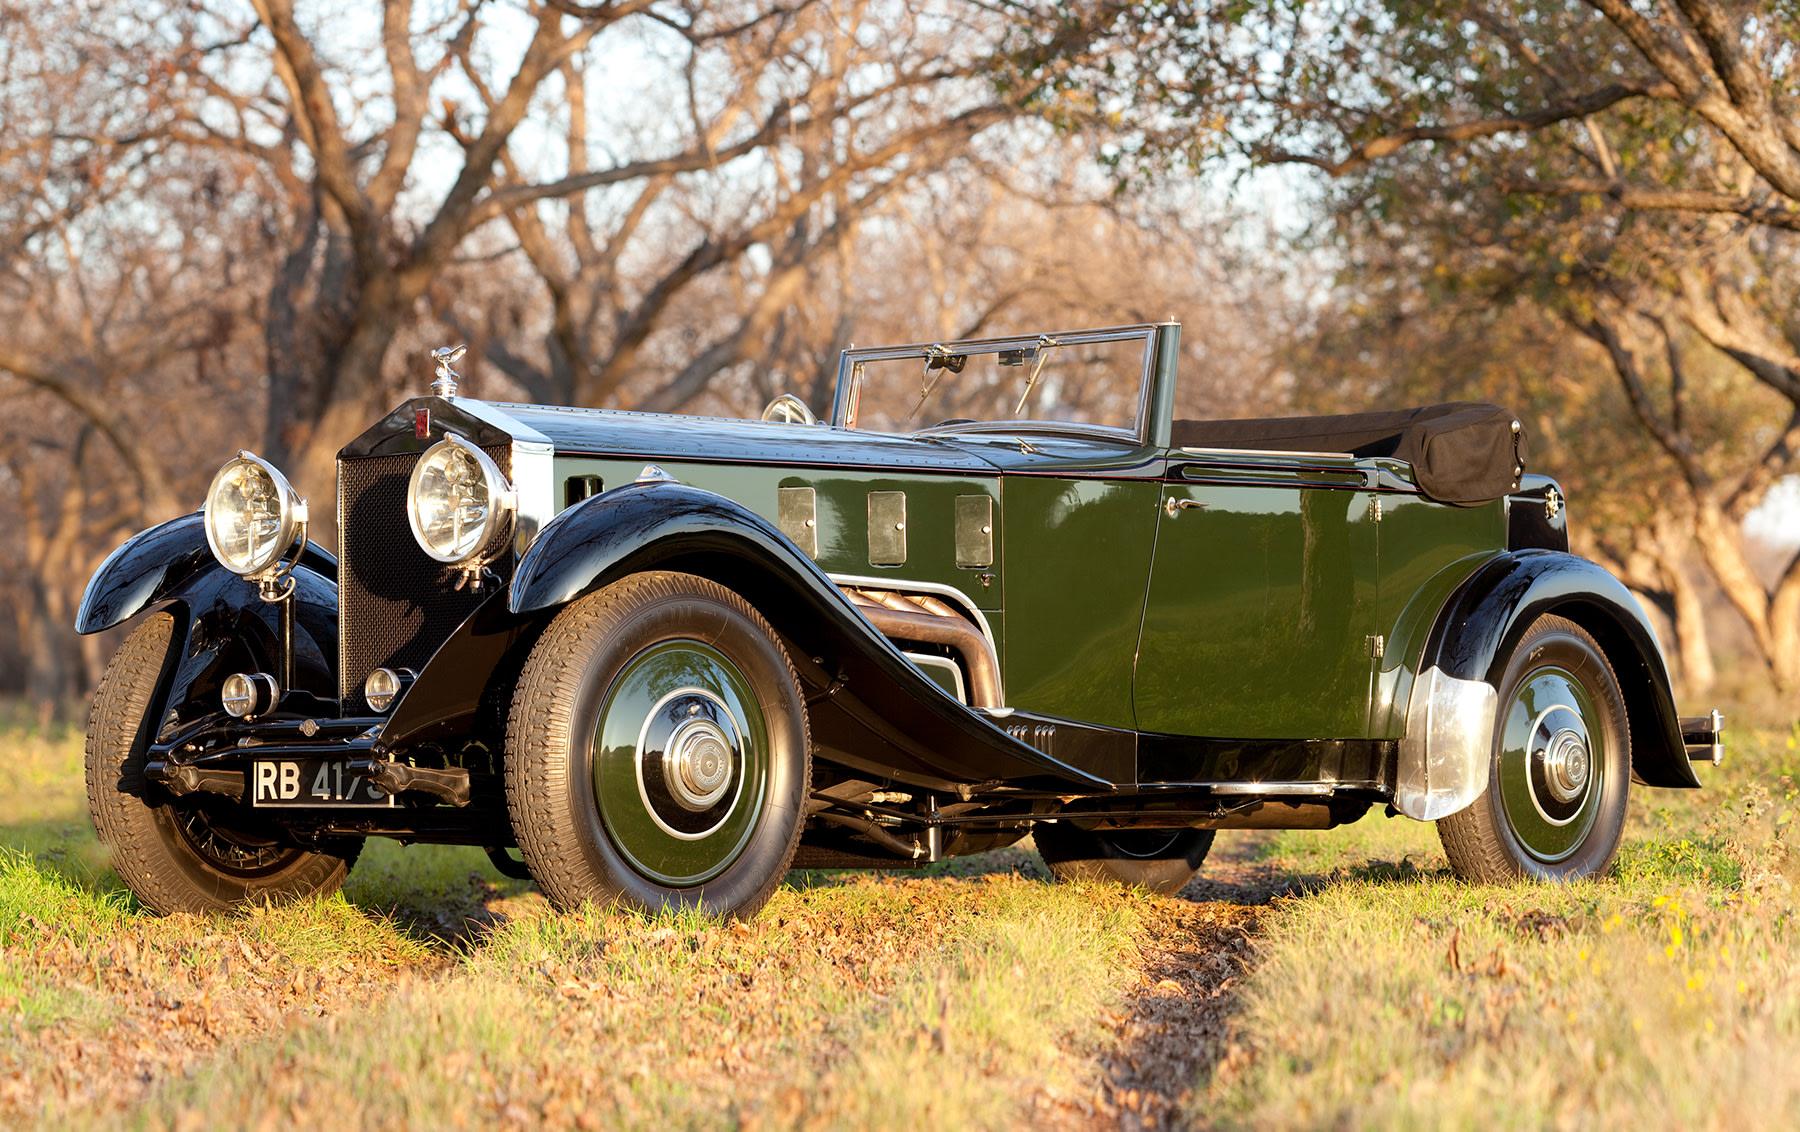 1931 Rolls-Royce Phantom II Drop Head Coupe